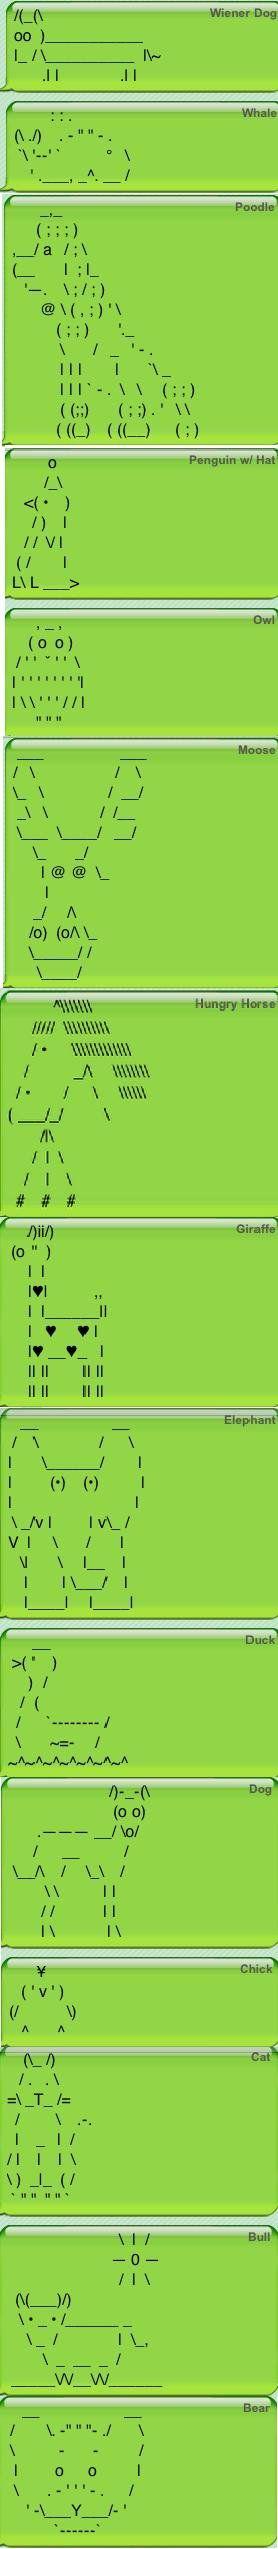 107 best Emoji images on Pinterest Emoji things, Unicorn and Awesome